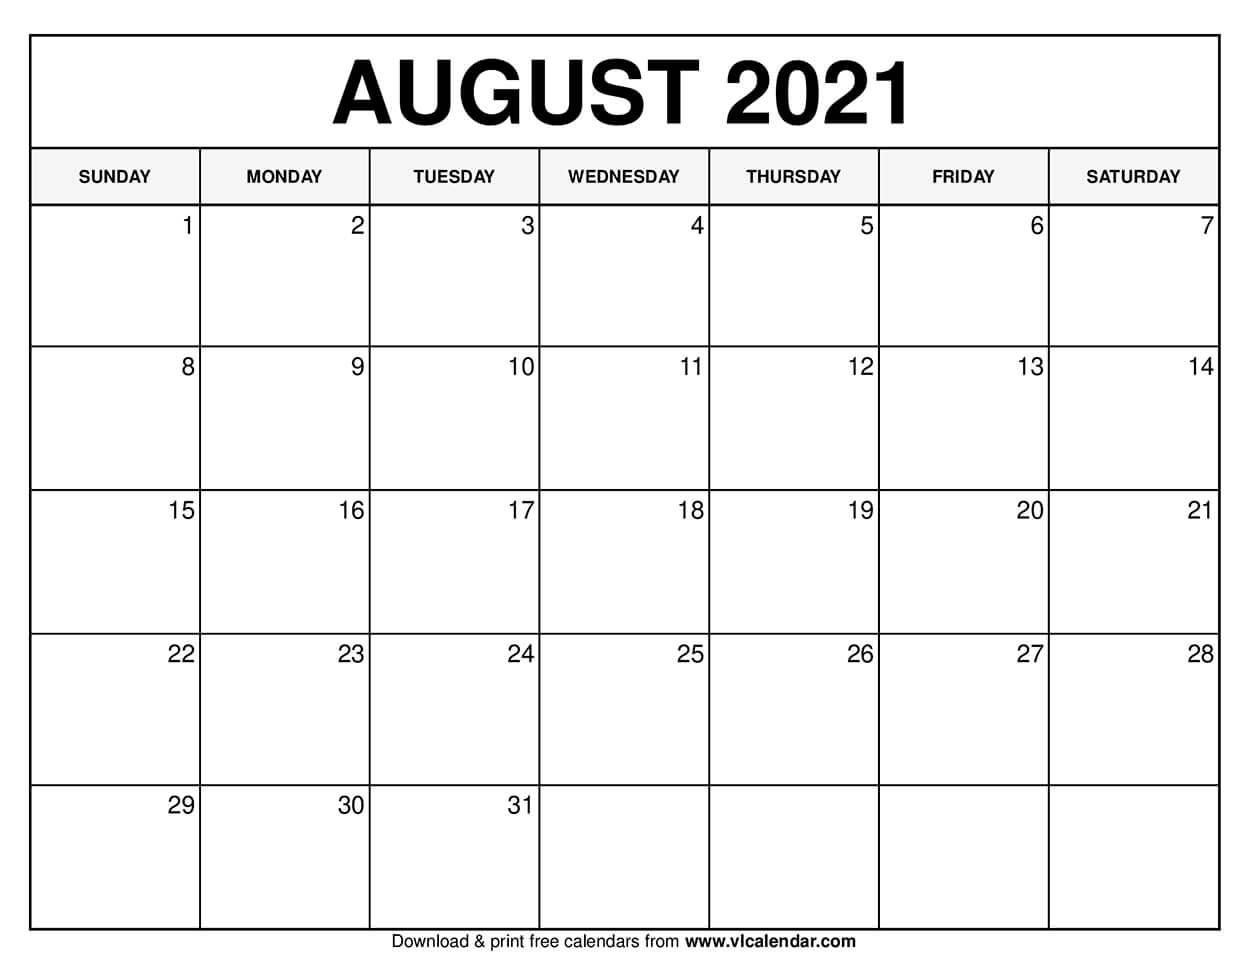 Take August Calendar 2021